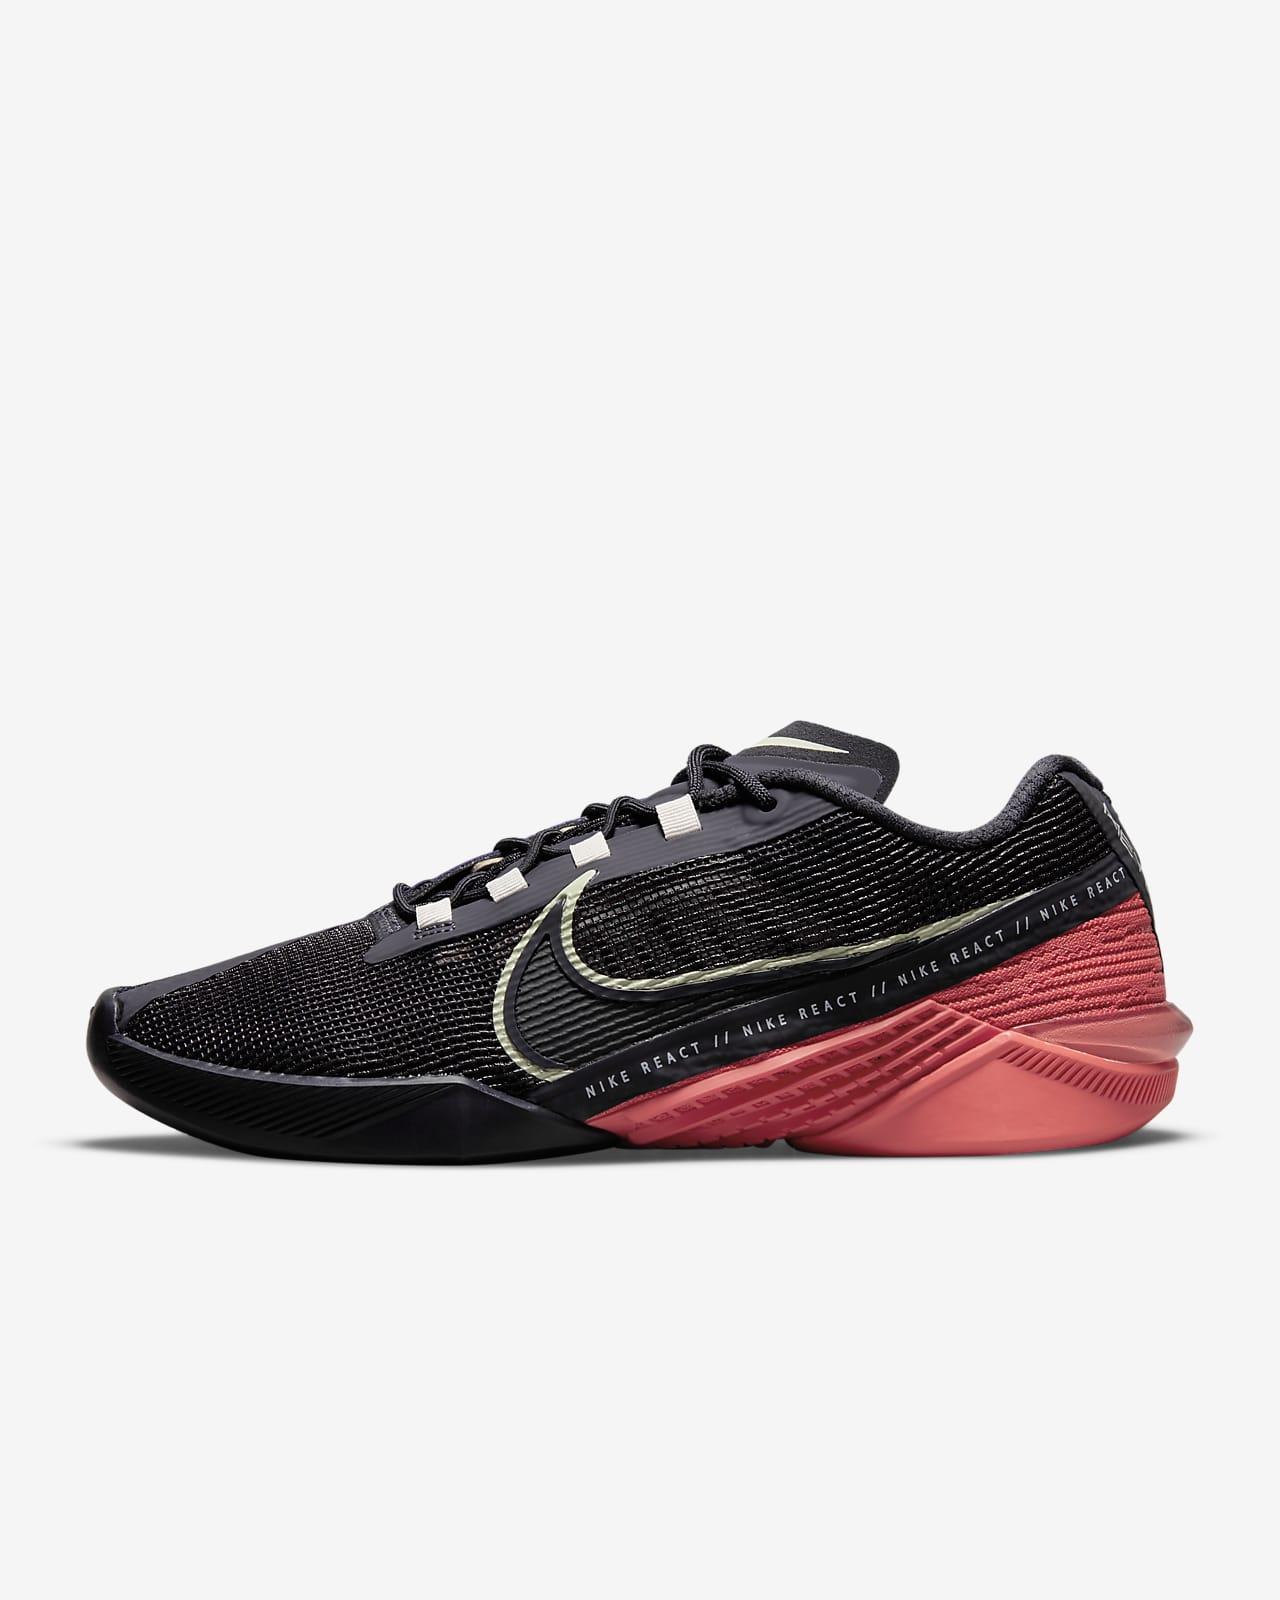 Calzado de entrenamiento para mujer Nike React Metcon Turbo